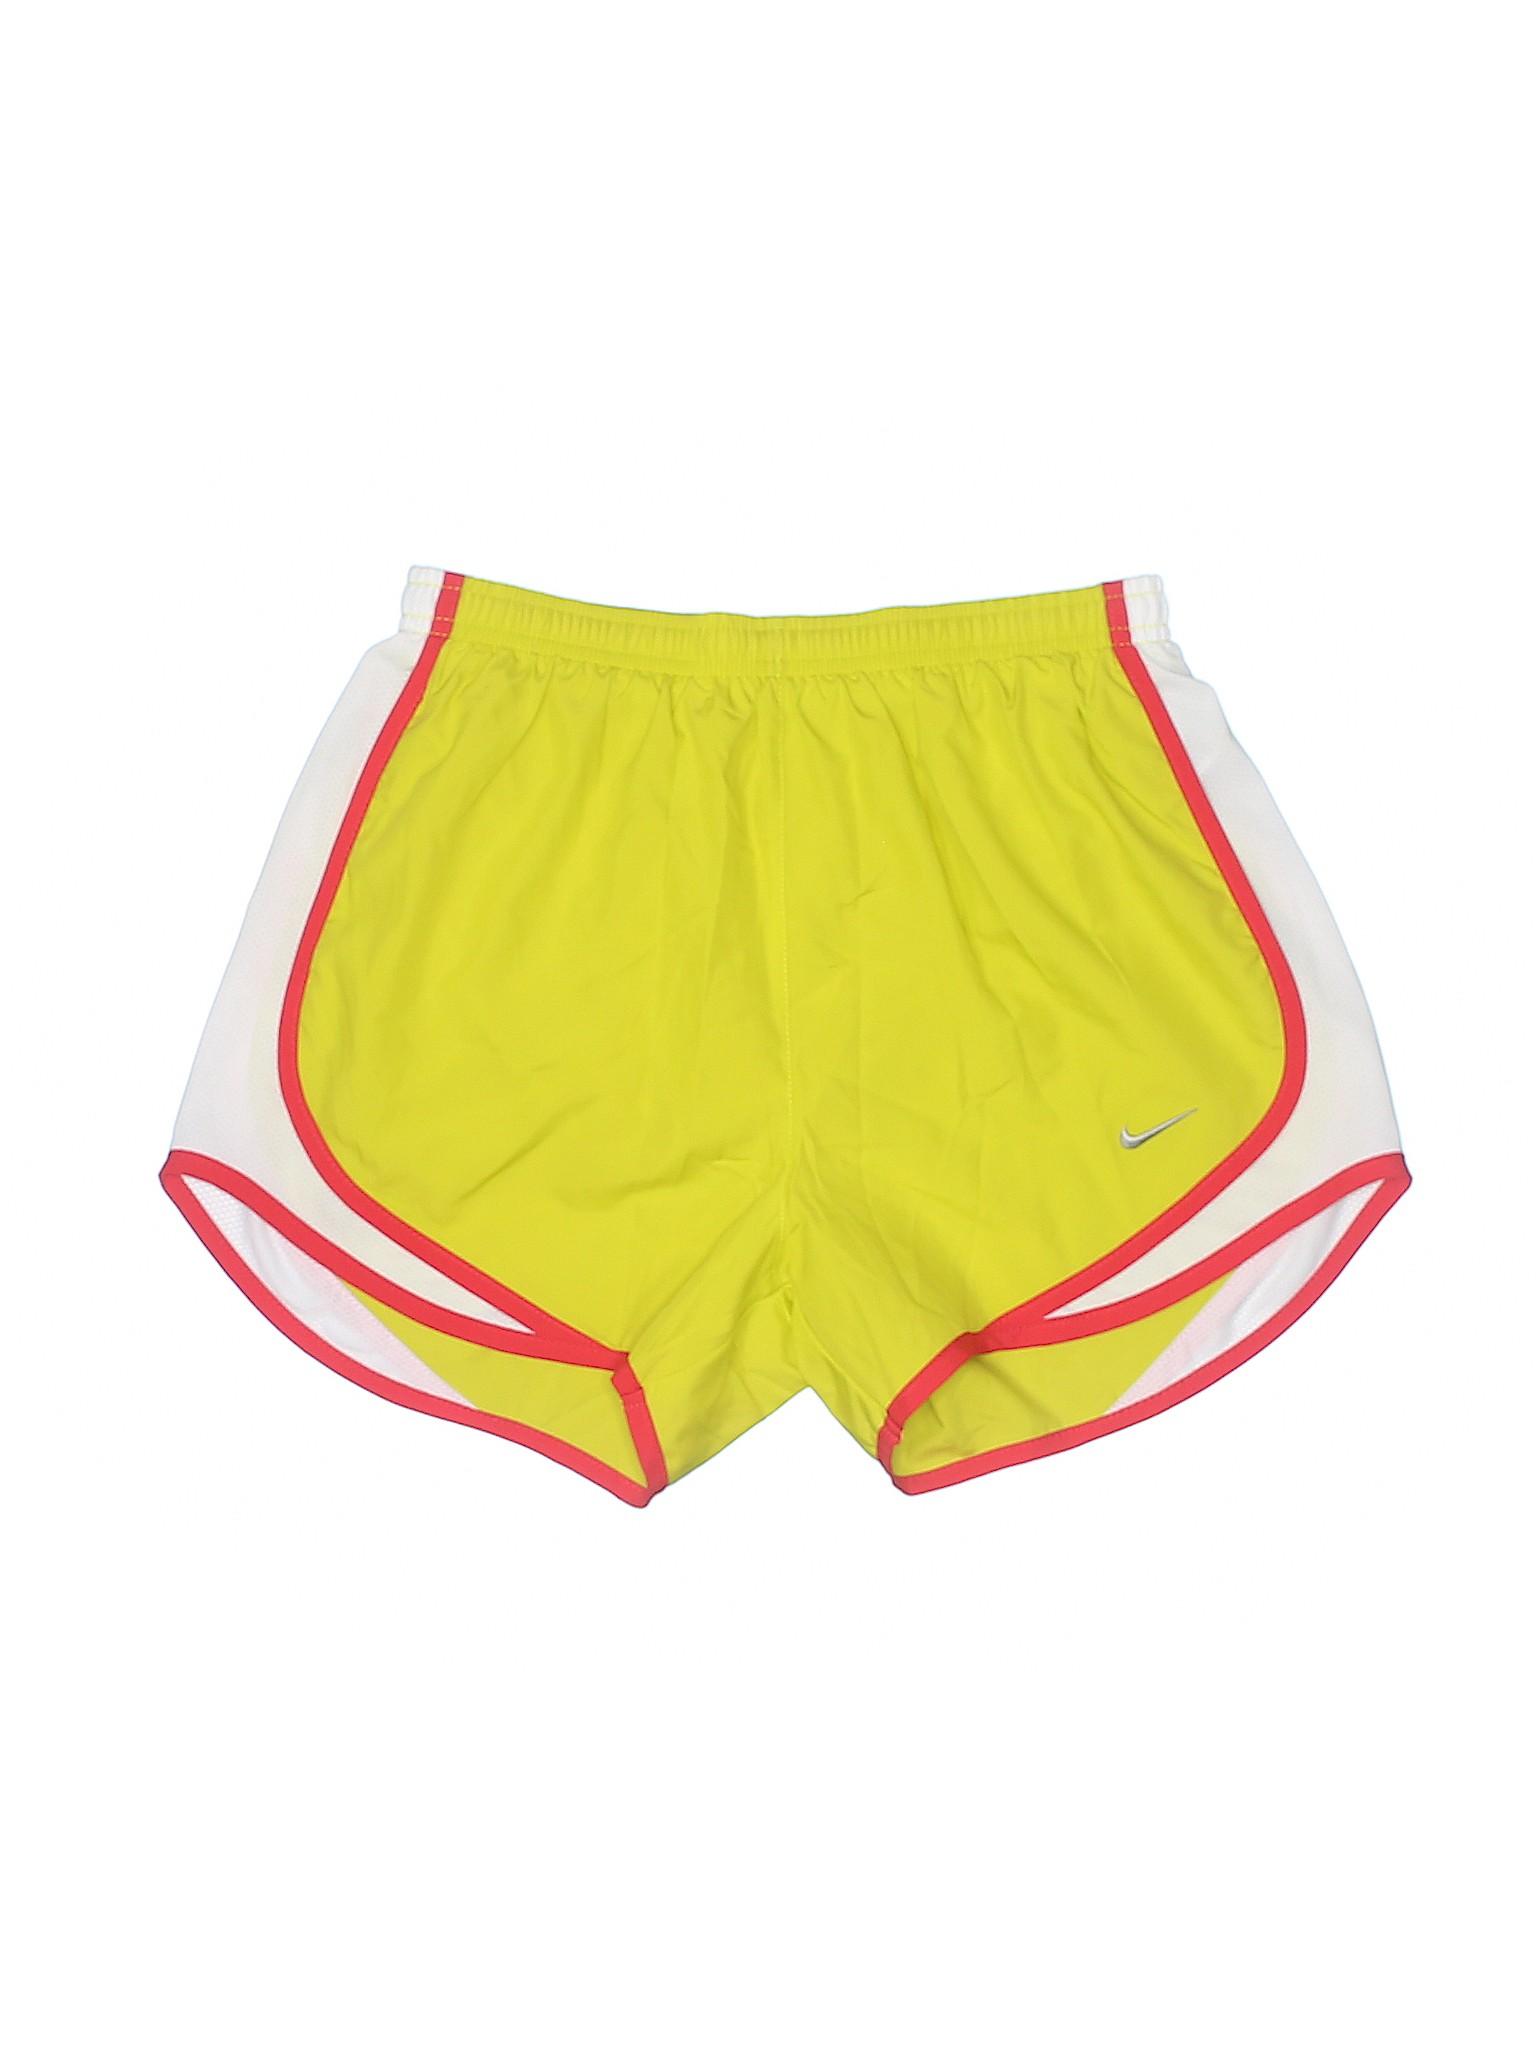 Boutique Boutique Nike Nike Athletic Shorts Nike Boutique Athletic Shorts RwRxXI6Sq